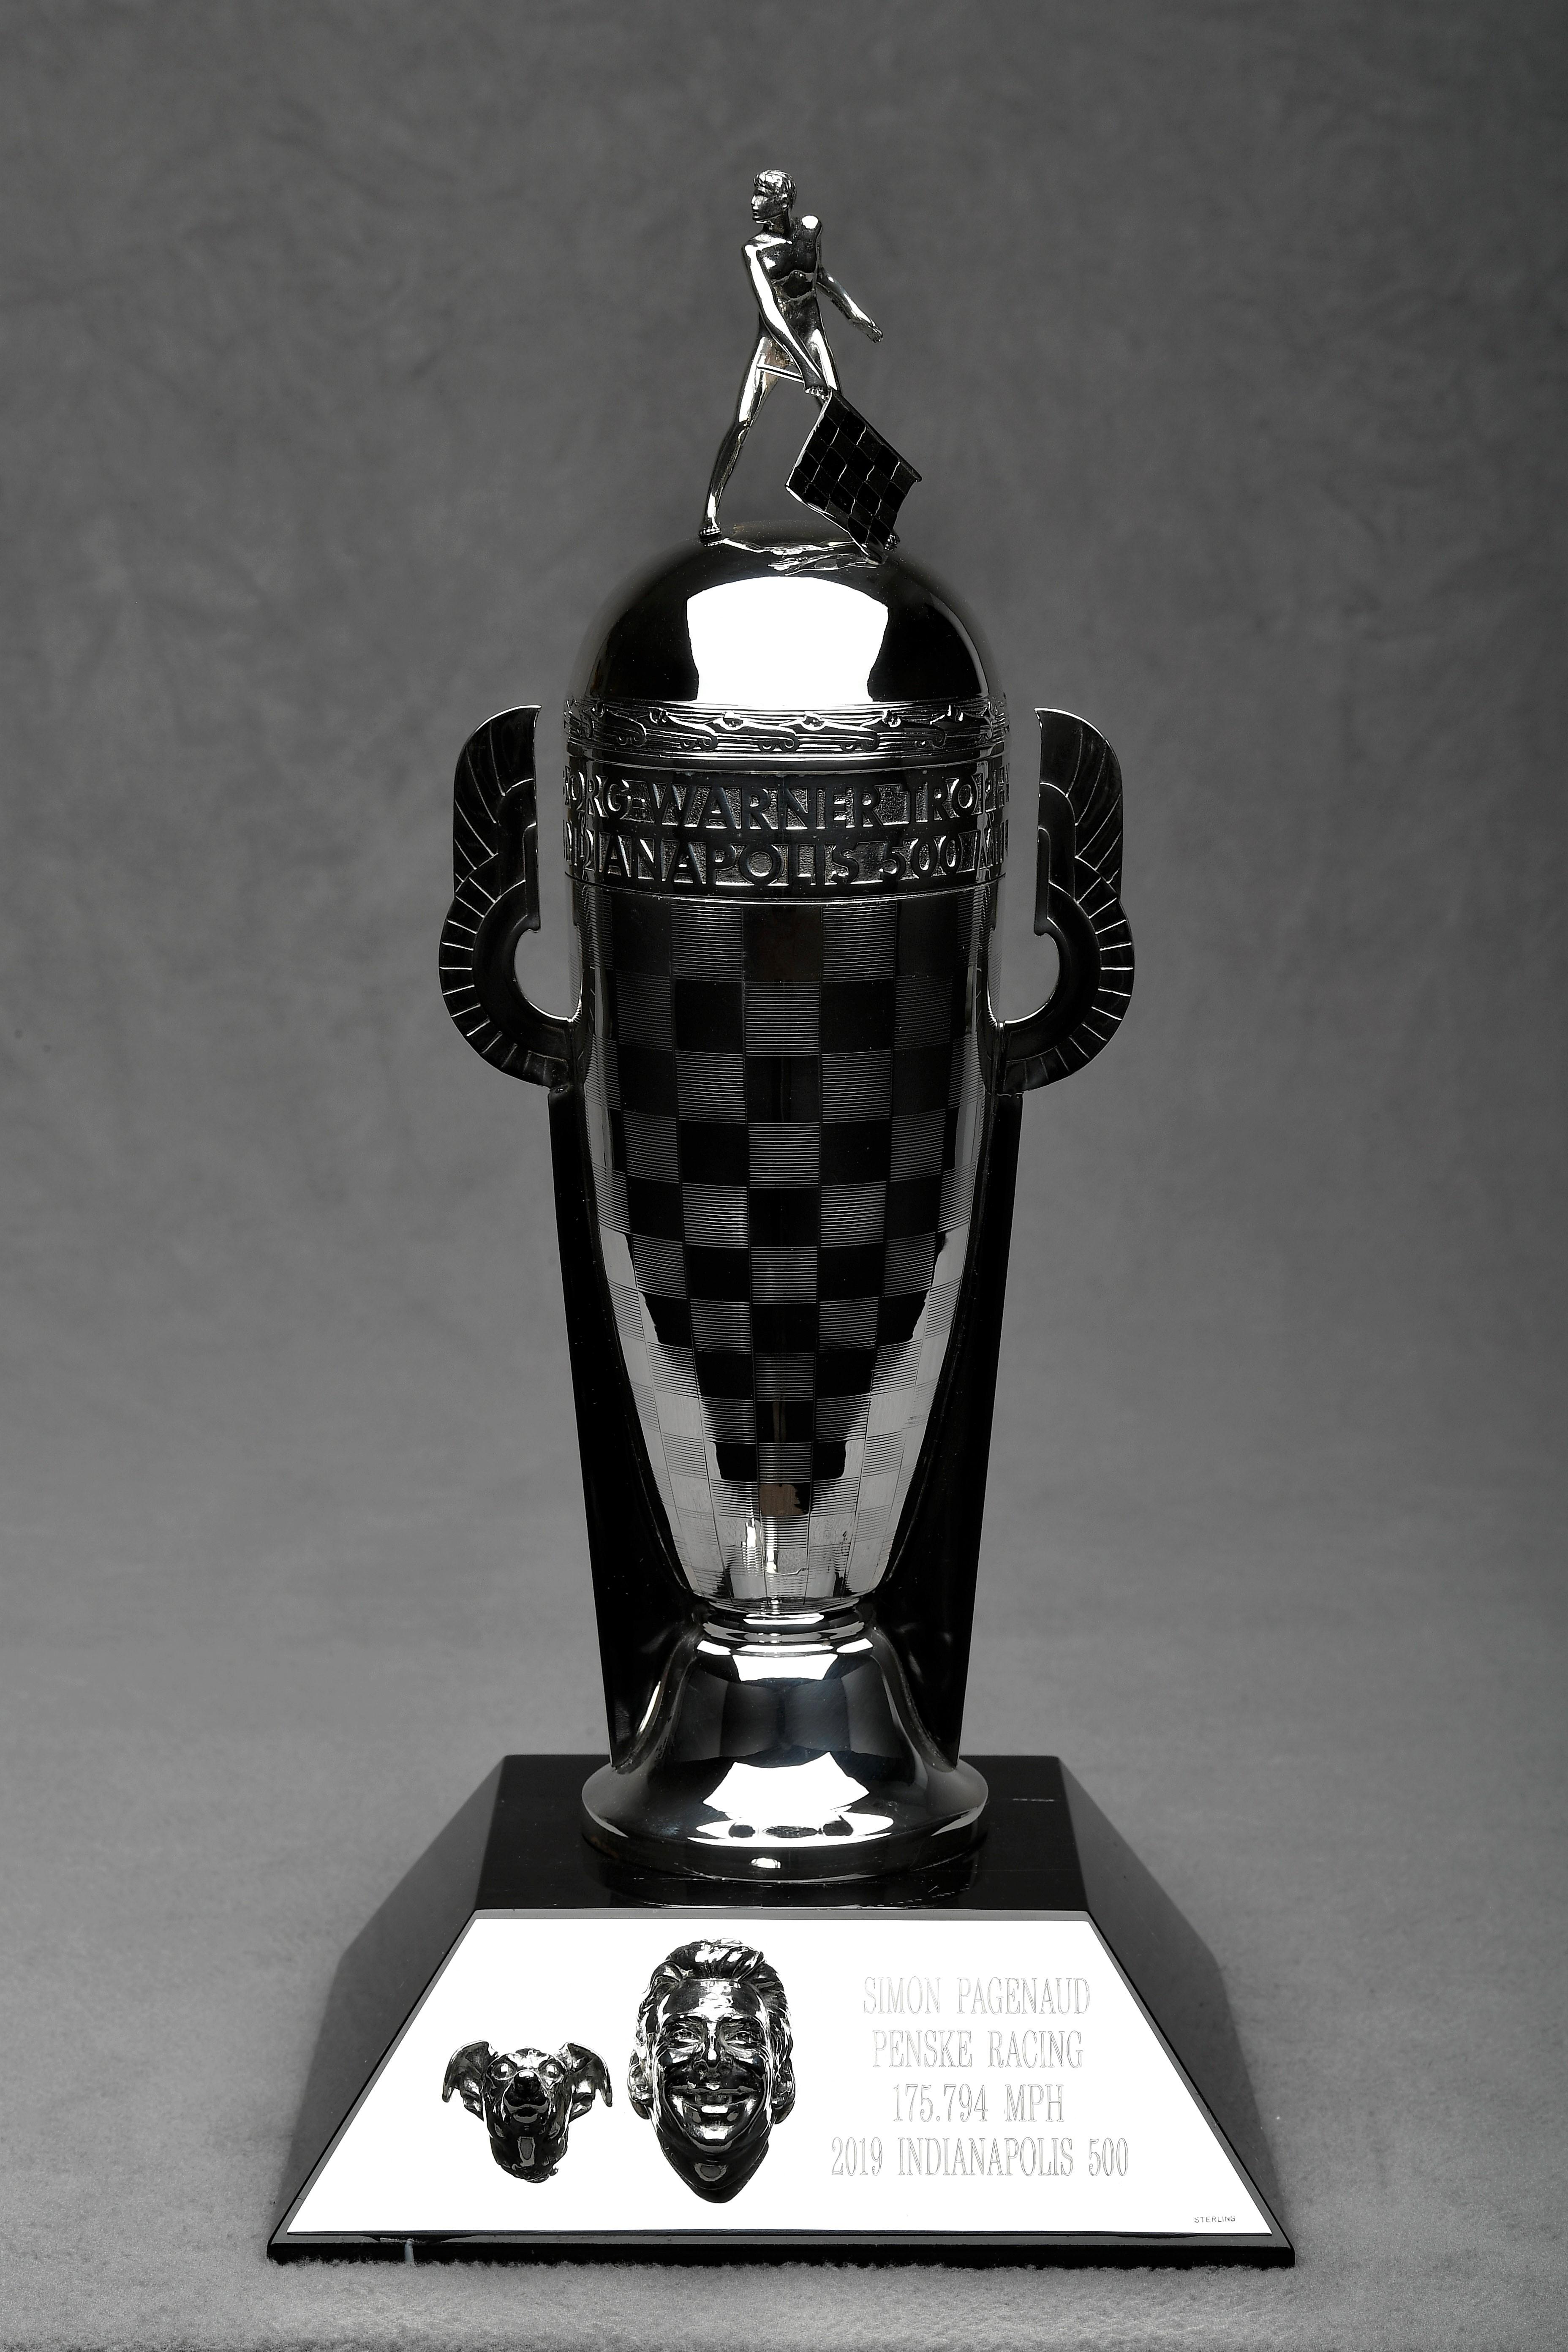 BW-00629 Trophy 4